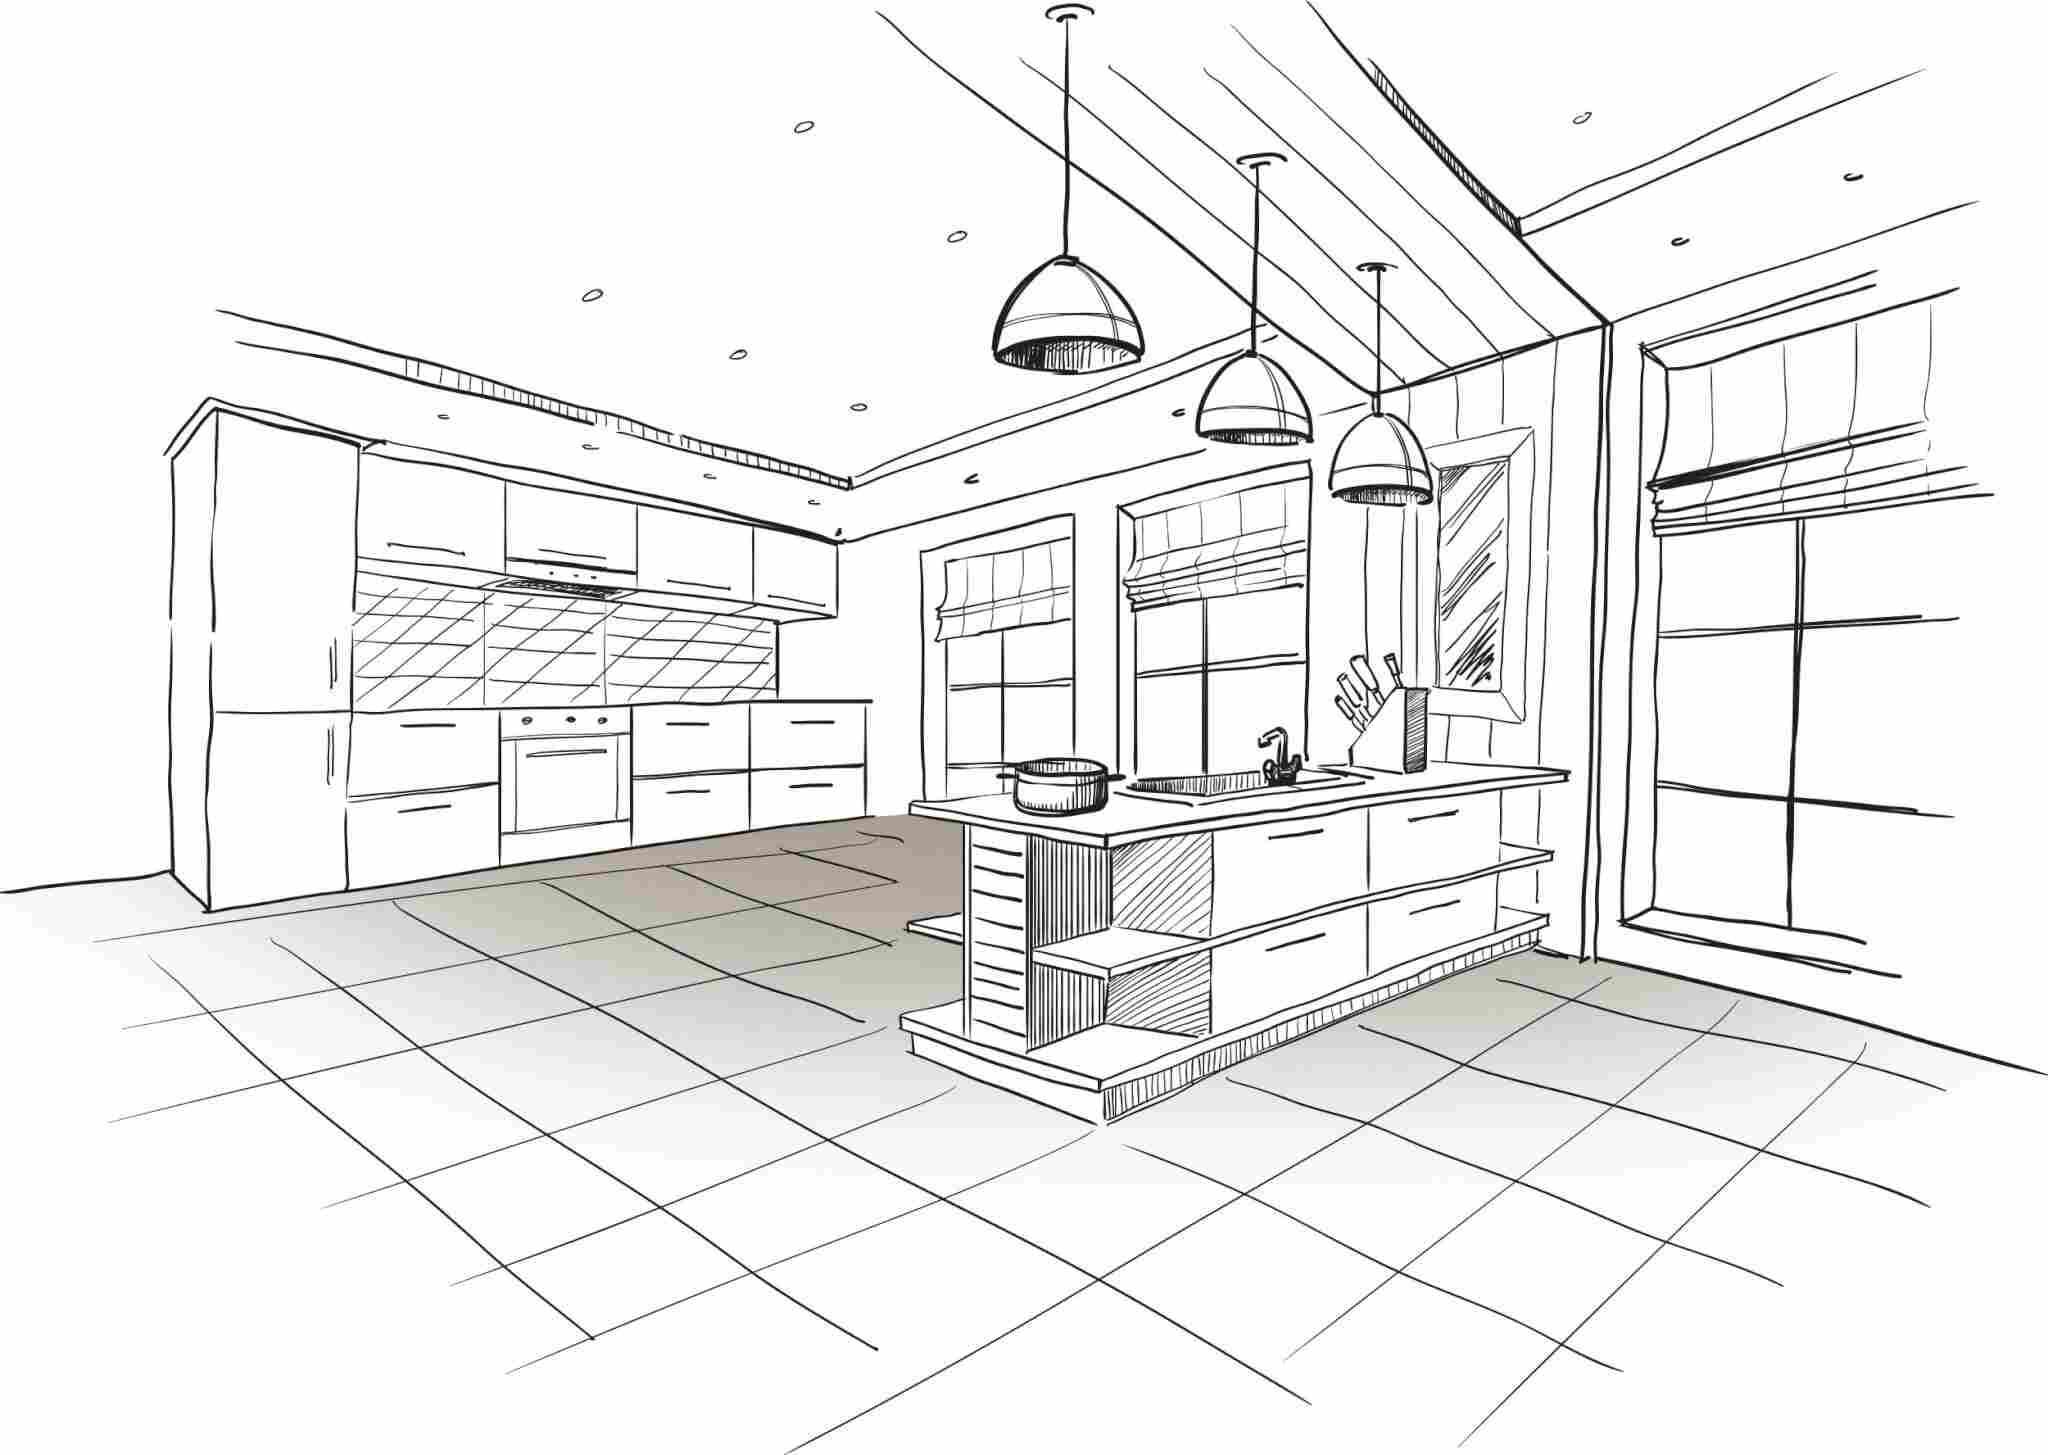 http://floorandbathdesign.ca/wp-content/uploads/2019/03/image-drawing-02.jpg